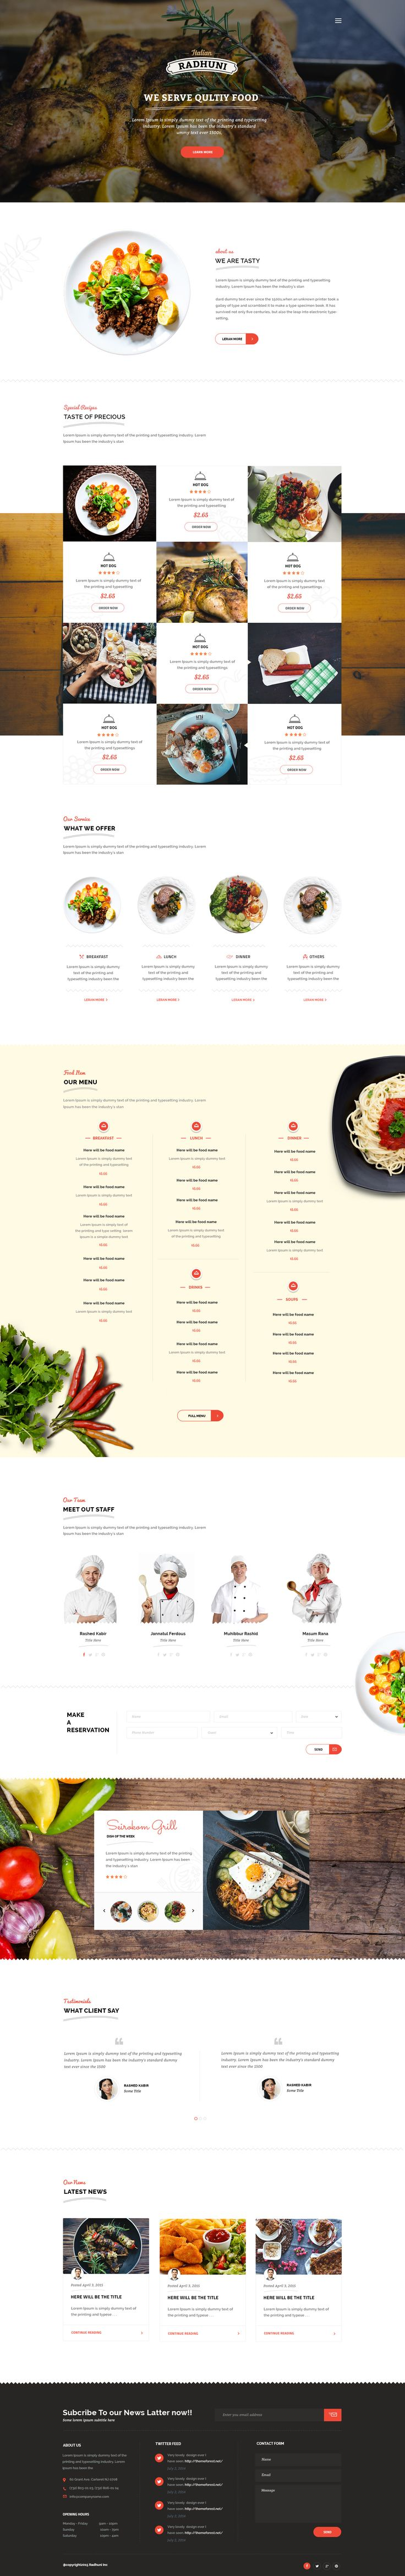 Italian Radhuni - Food & Resturant WordPress Theme #wordpress #pizza #chef • Download ➝ https://themeforest.net/item/italian-radhuni-food-resturant-wordpress-theme/12006256?ref=pxcr